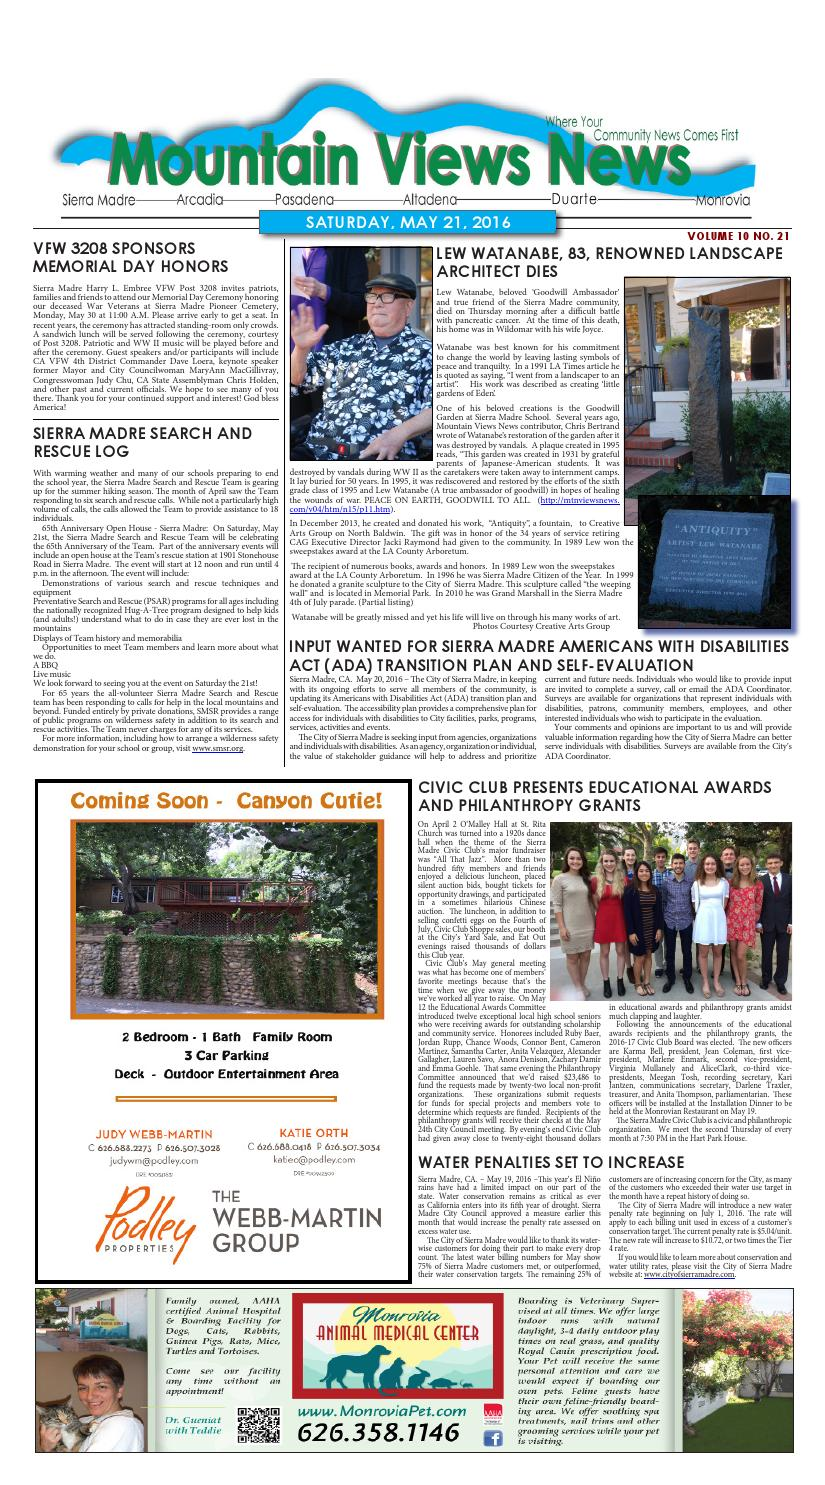 Mvnews 2016 05 21 by Mountain Views News - issuu